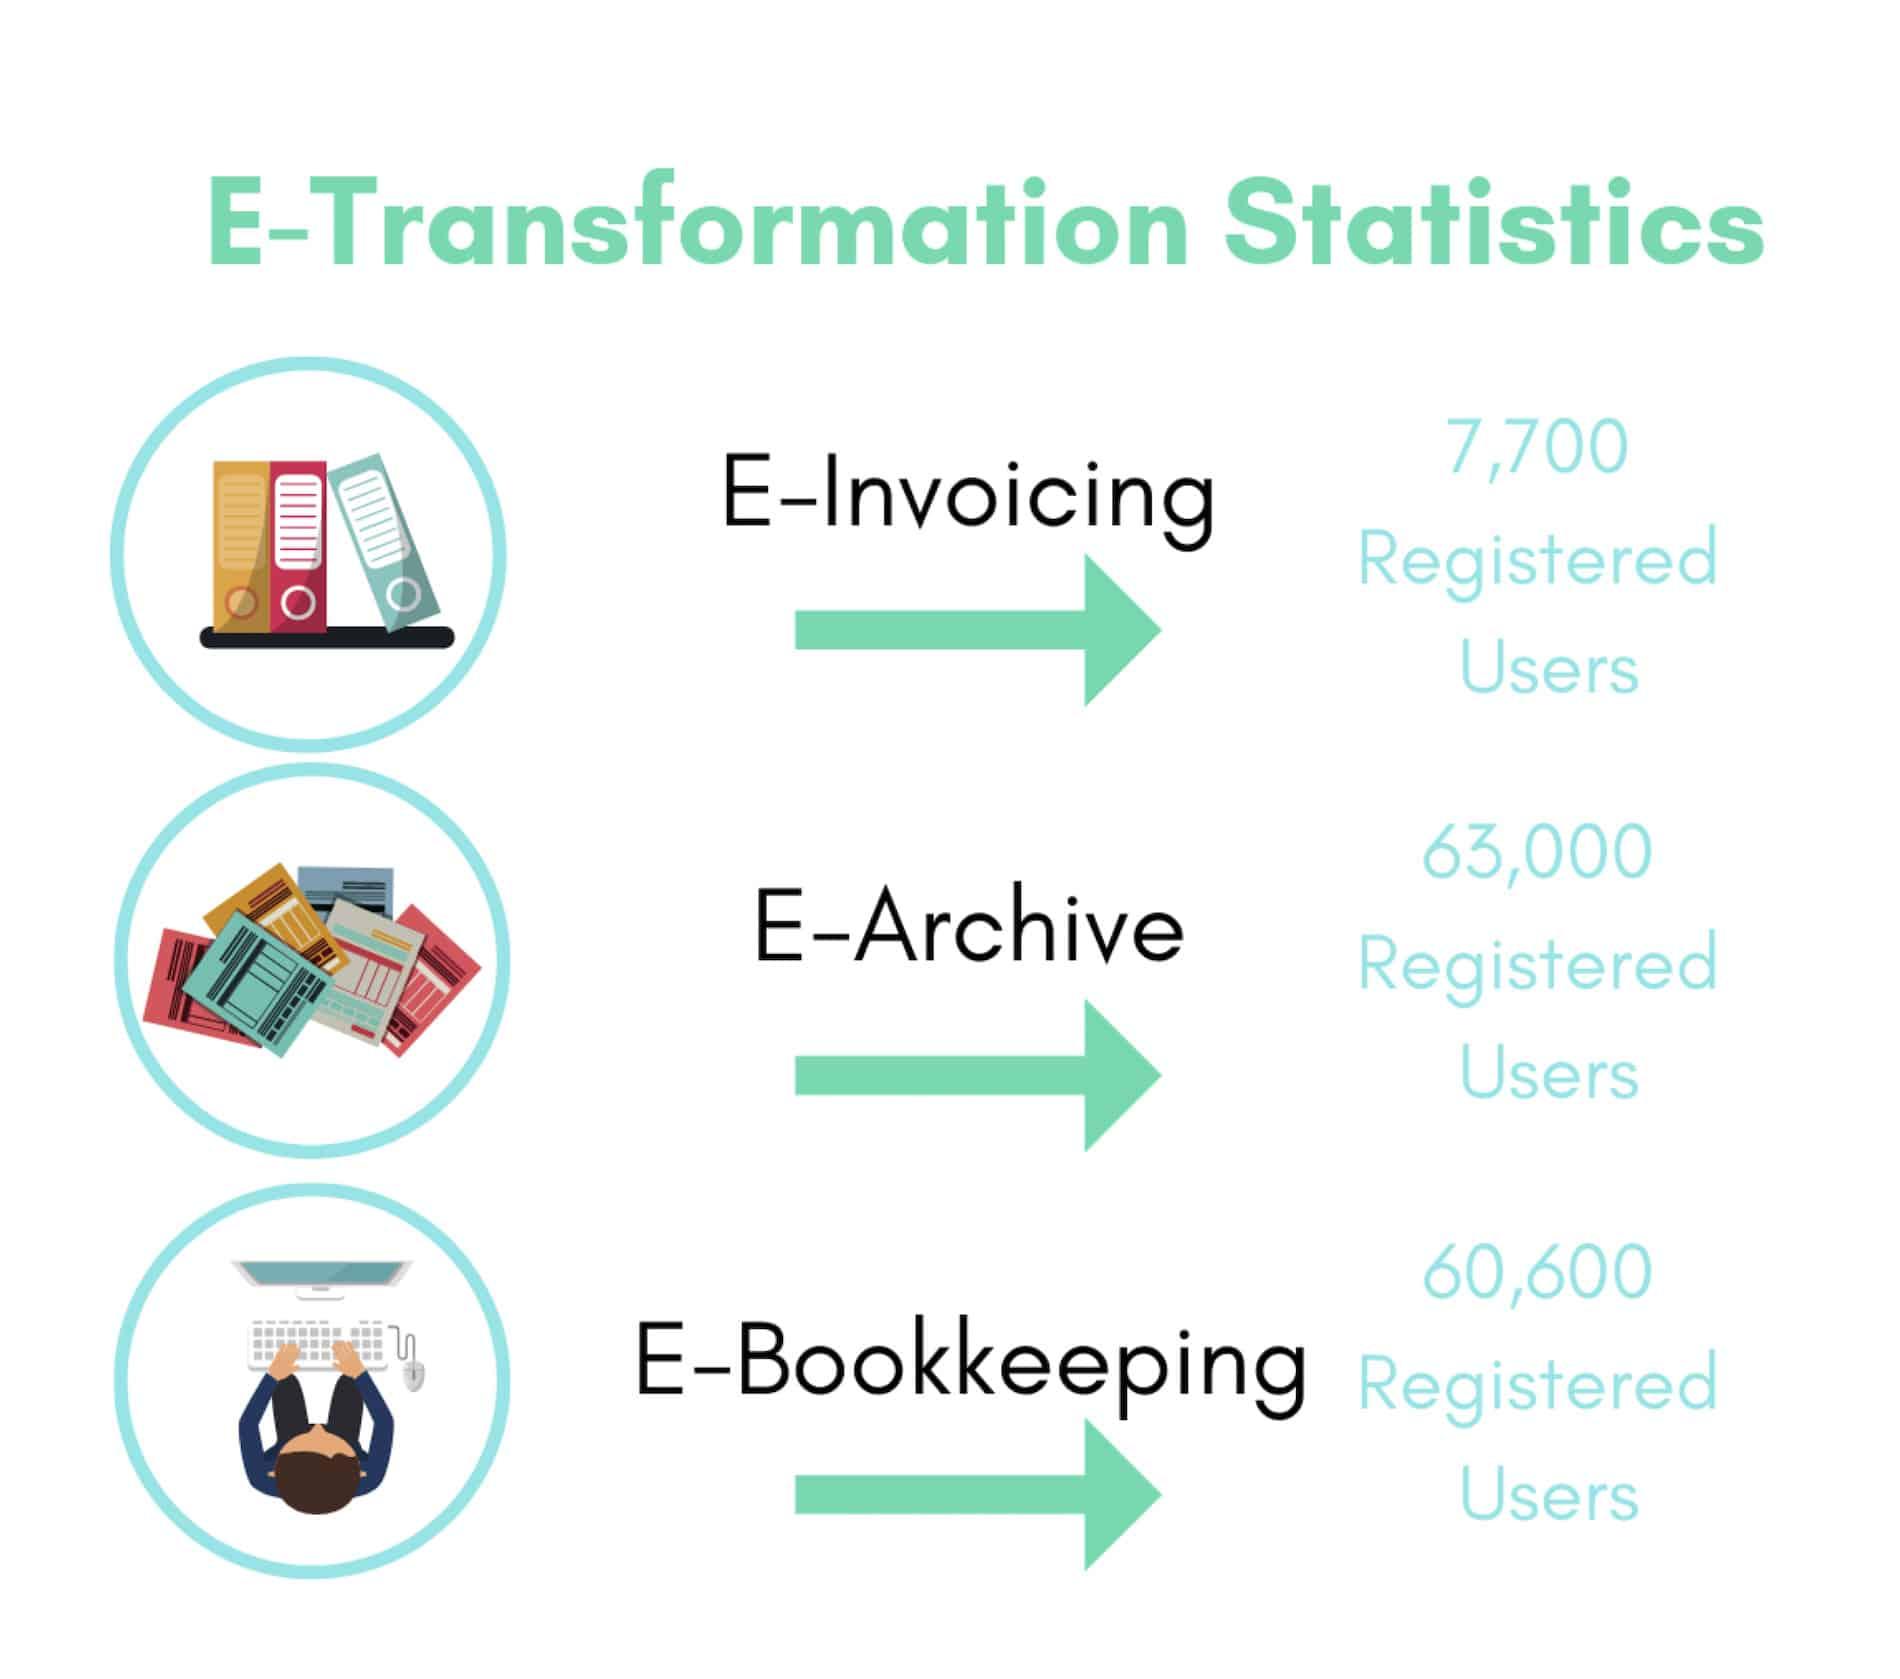 Statistics on e-Transformation in Turkey